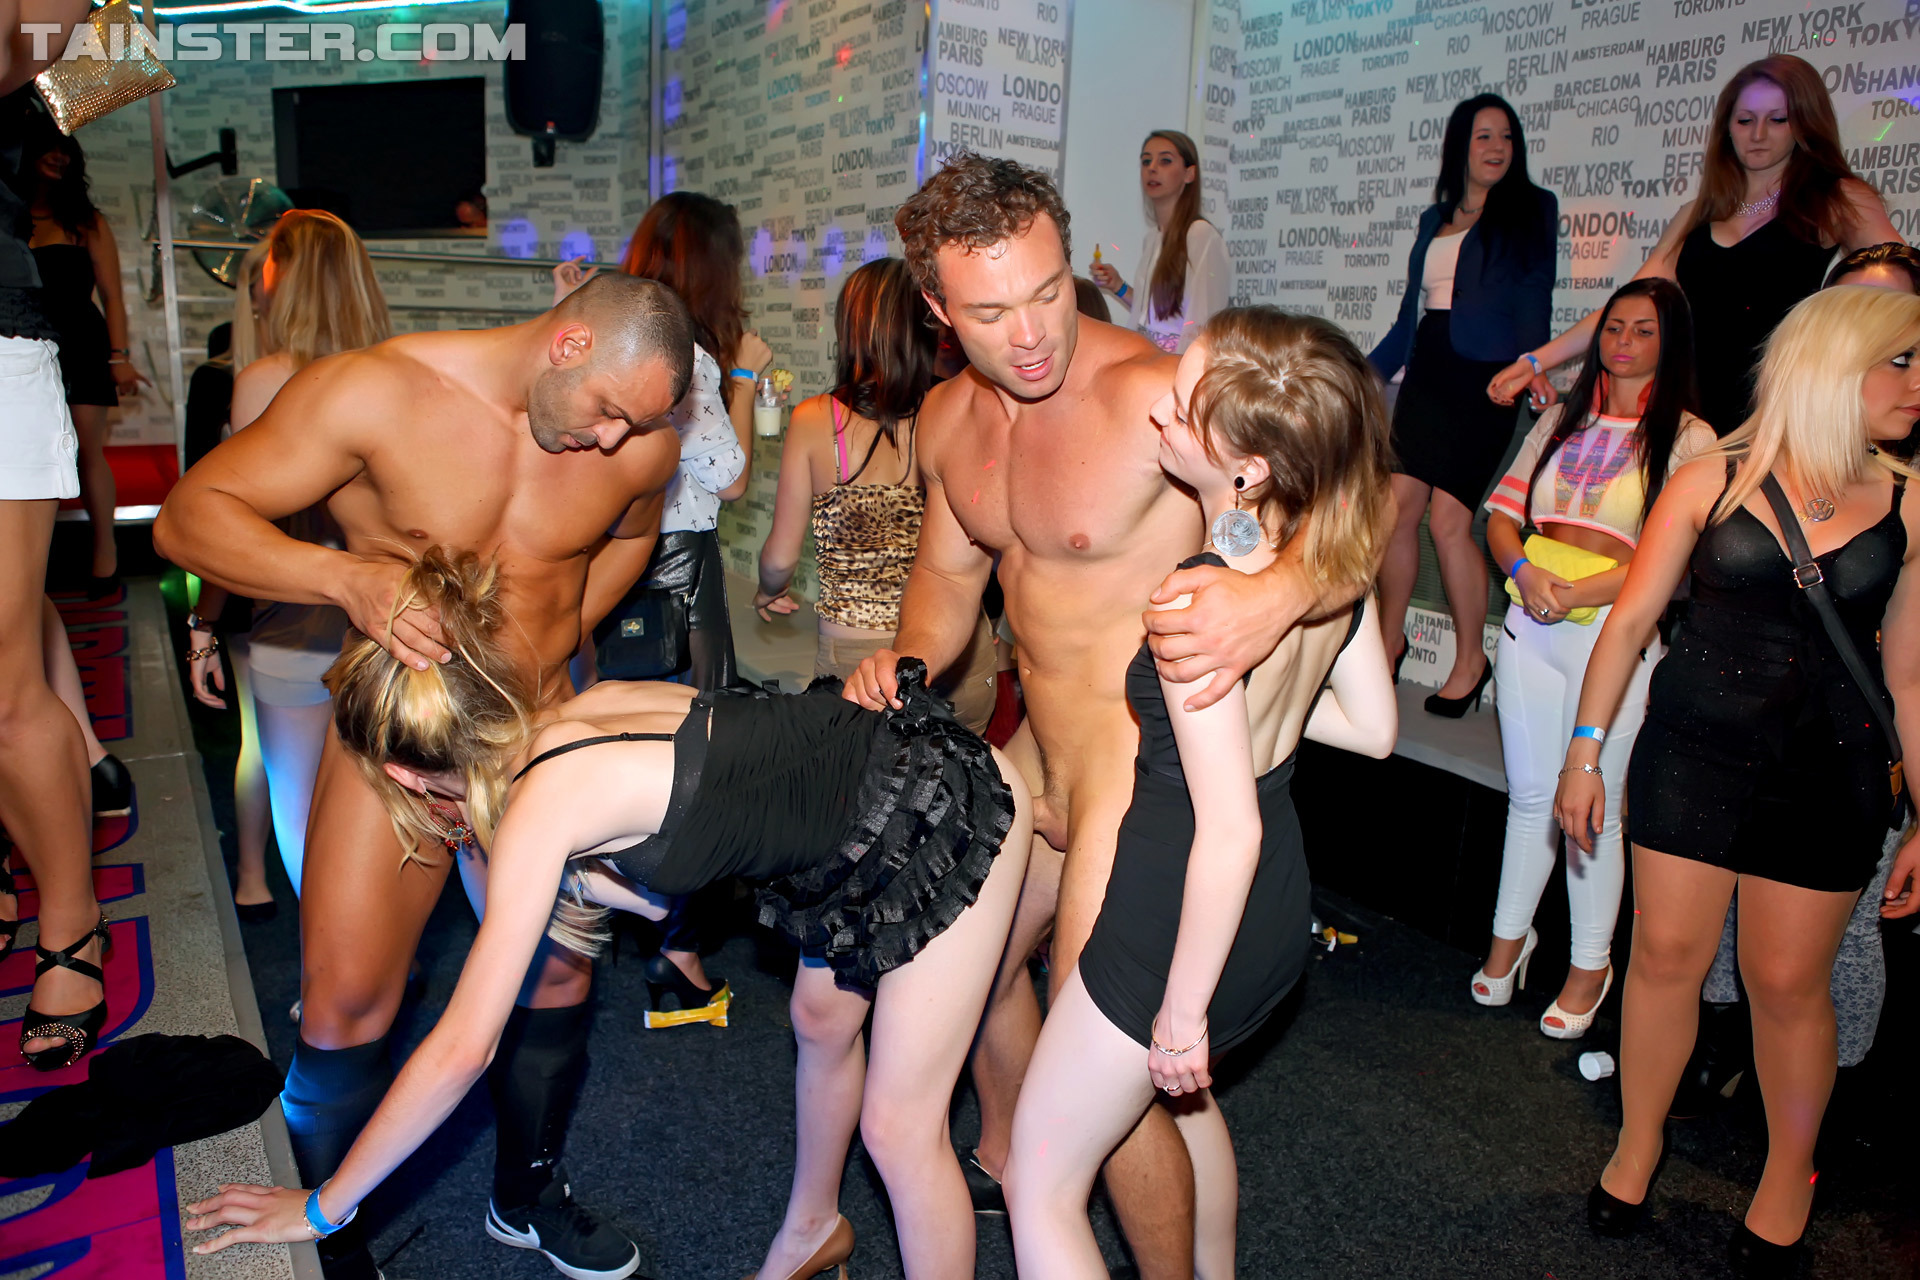 Party hardcore porn